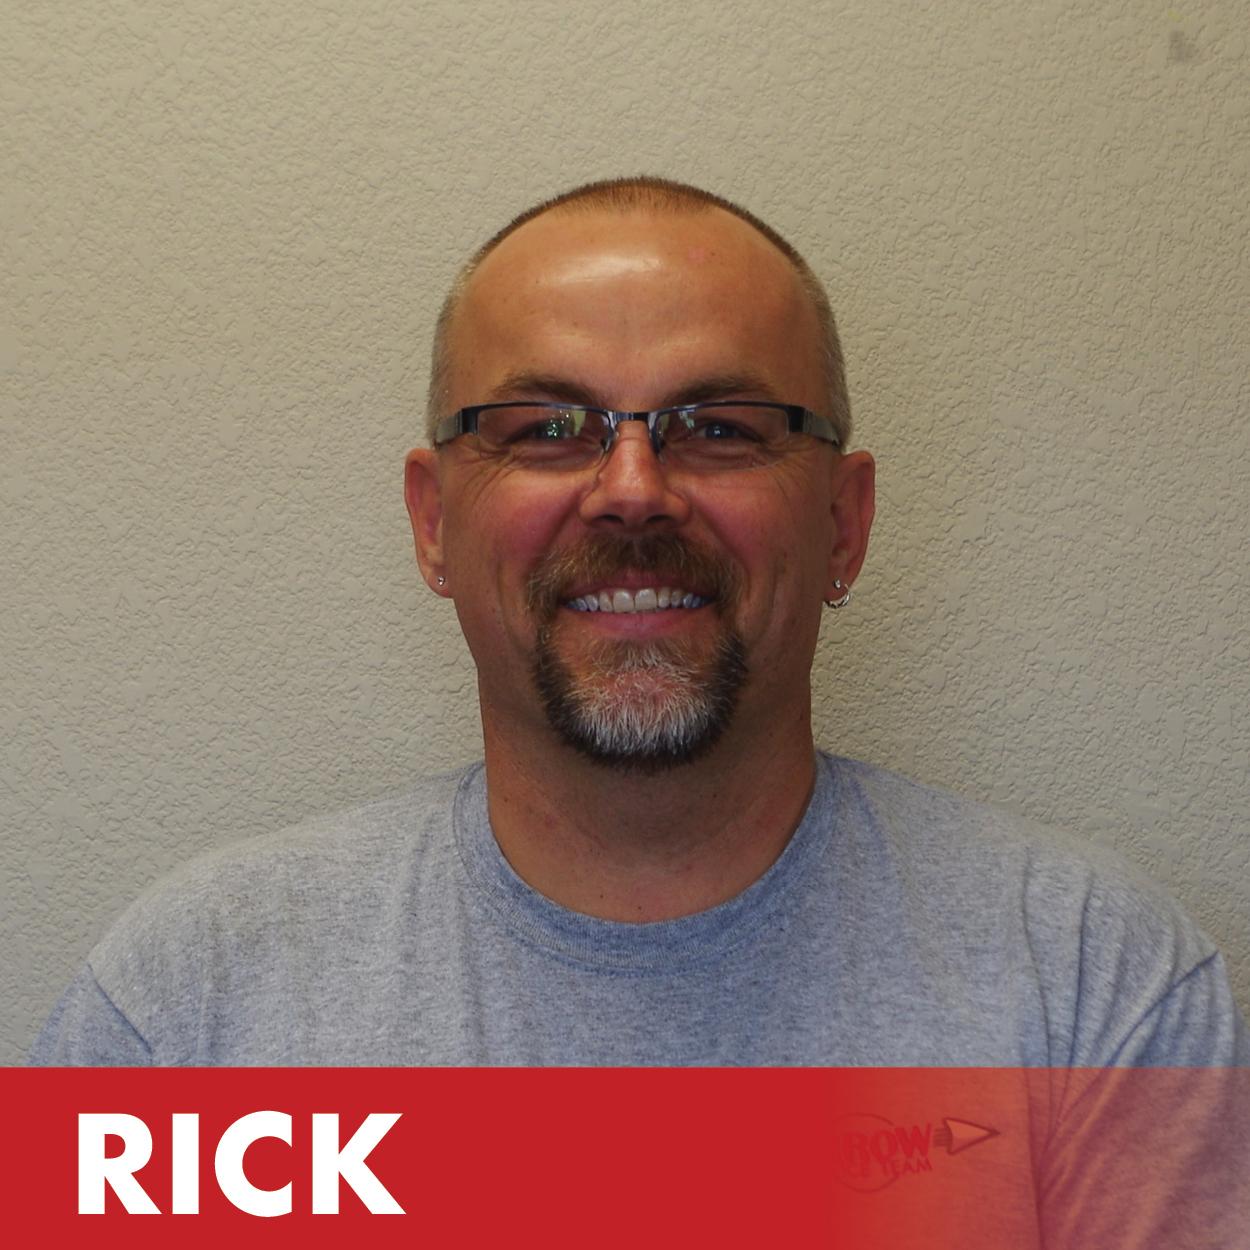 RICKM_web.jpg